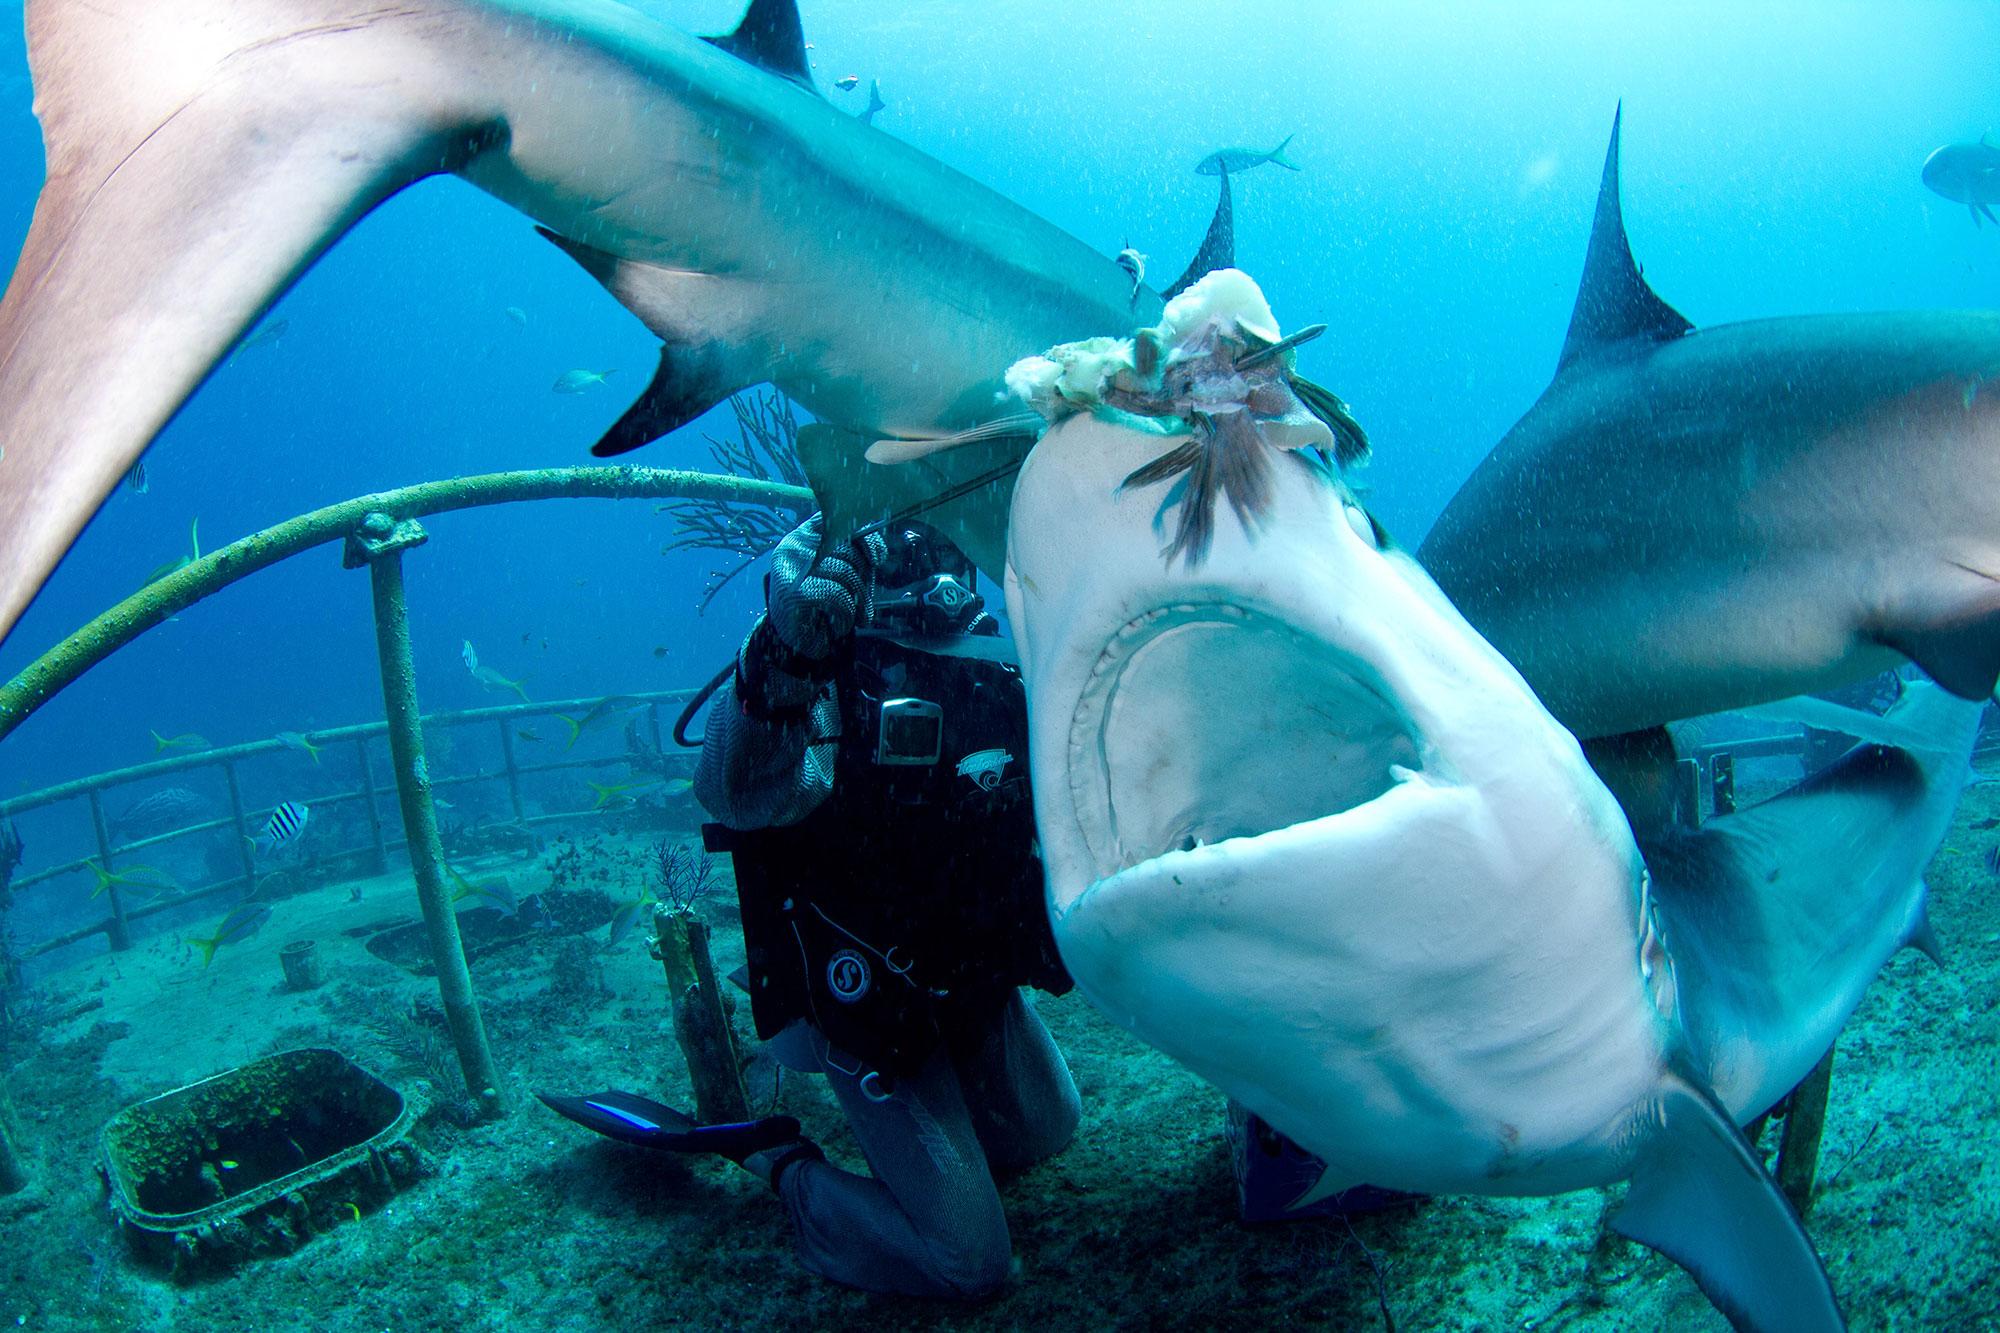 "Joi Ito feeding Carribean reef sharks. Photo by <a href=""https://www.flickr.com/photos/joi/5594869804/"">Sebastien Filion/Stuart Cove's</a>."